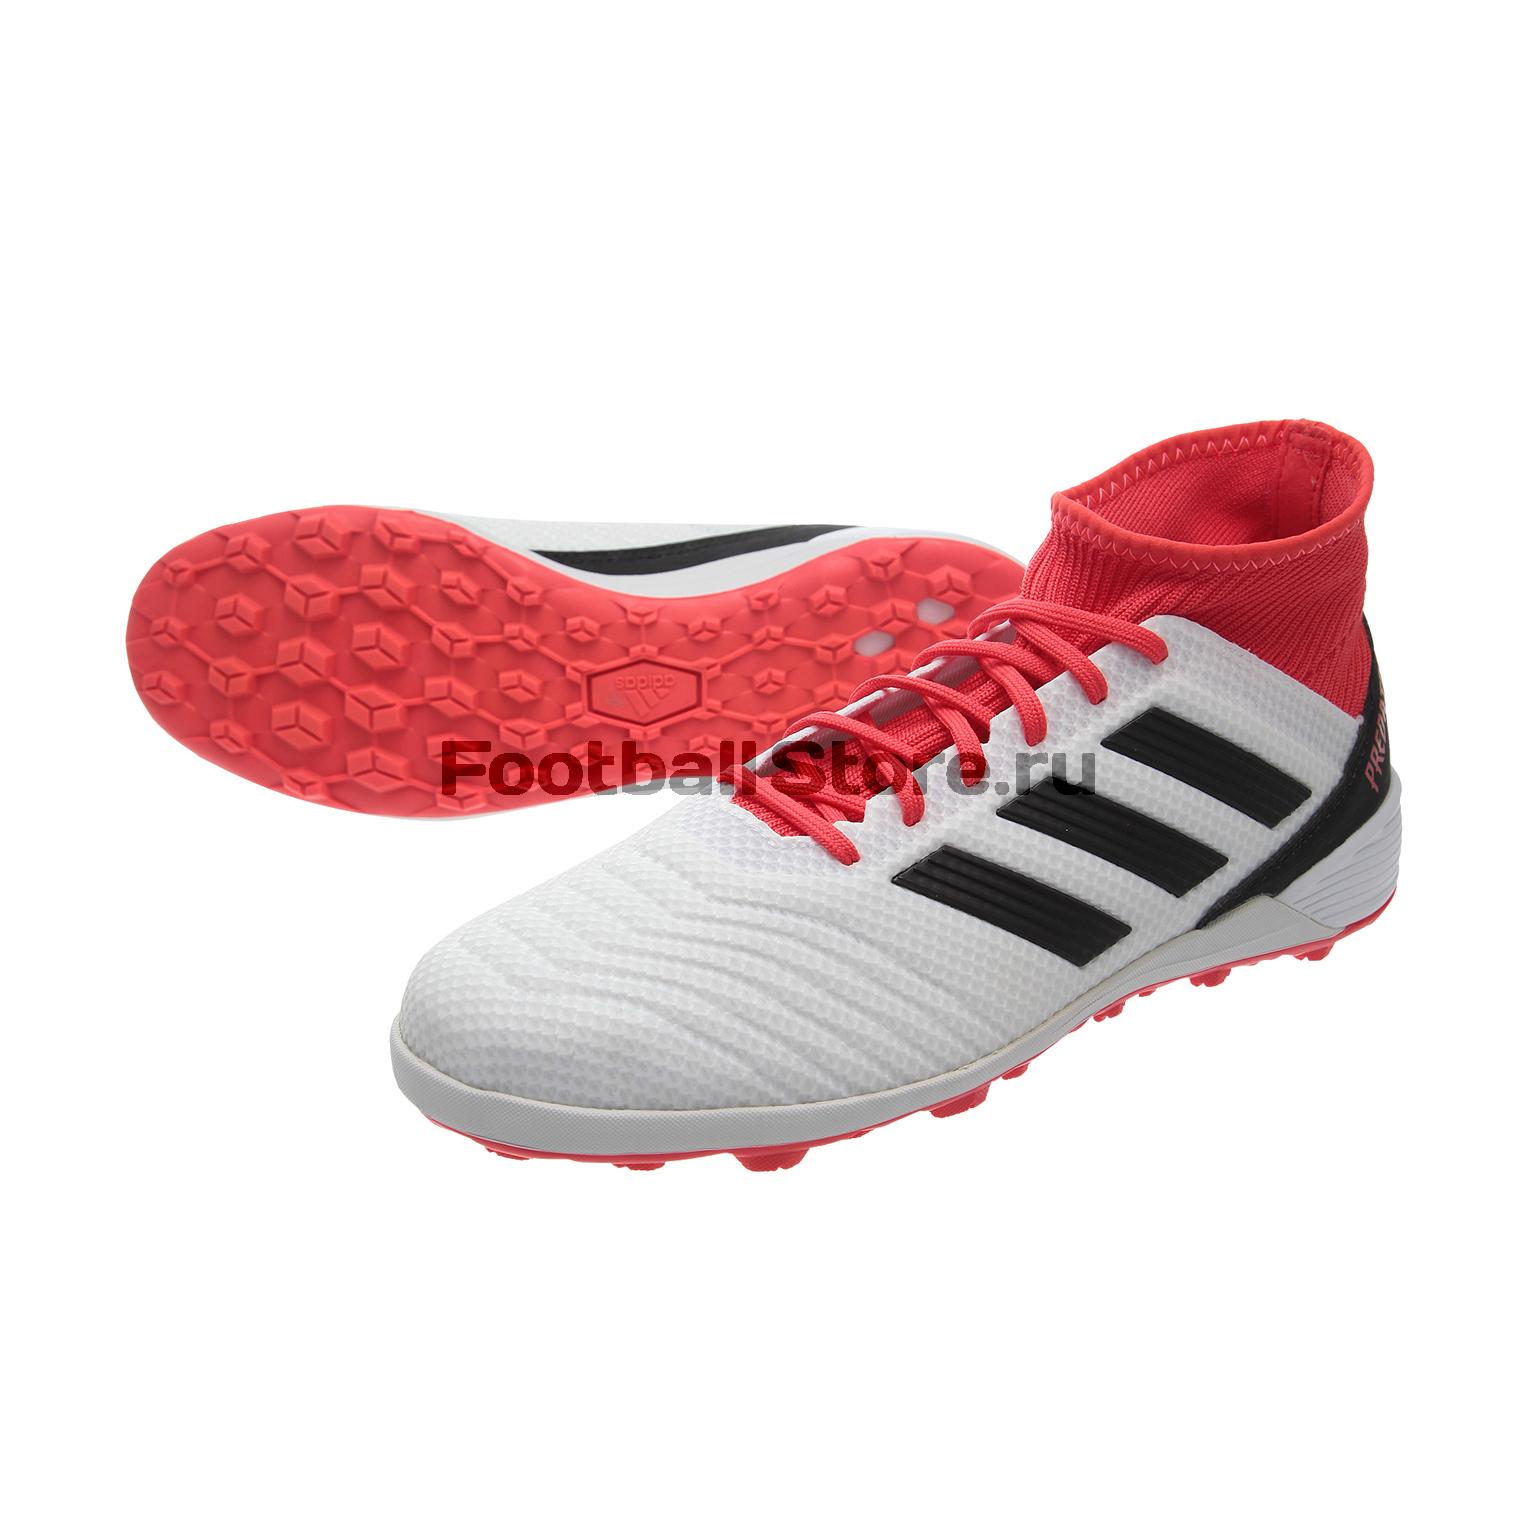 Шиповки Adidas Predator Tango 18.3 TF CP9930 adidas predator junior gk glove